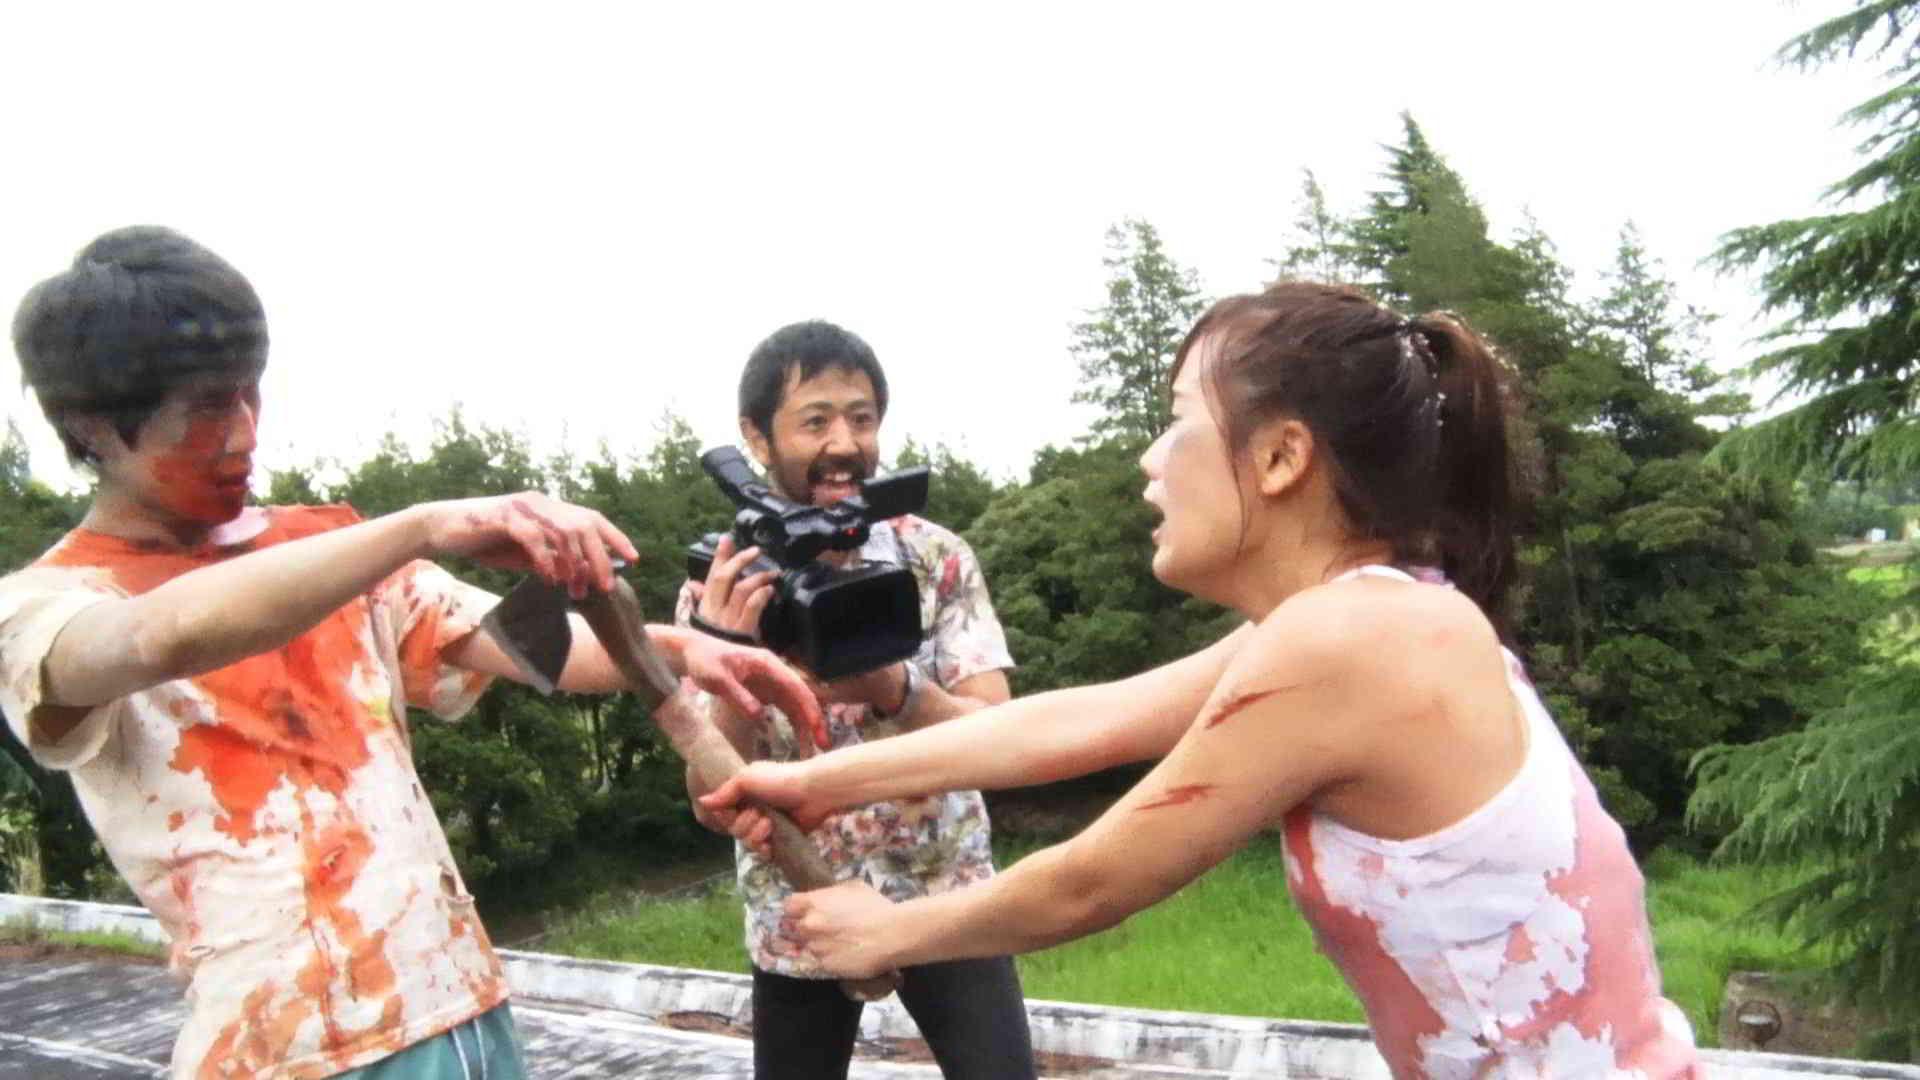 Zombie contro zombie - Takayuki Hamatsu, Yuzuki Akiyama e Kazuaki Nagaya in una scena